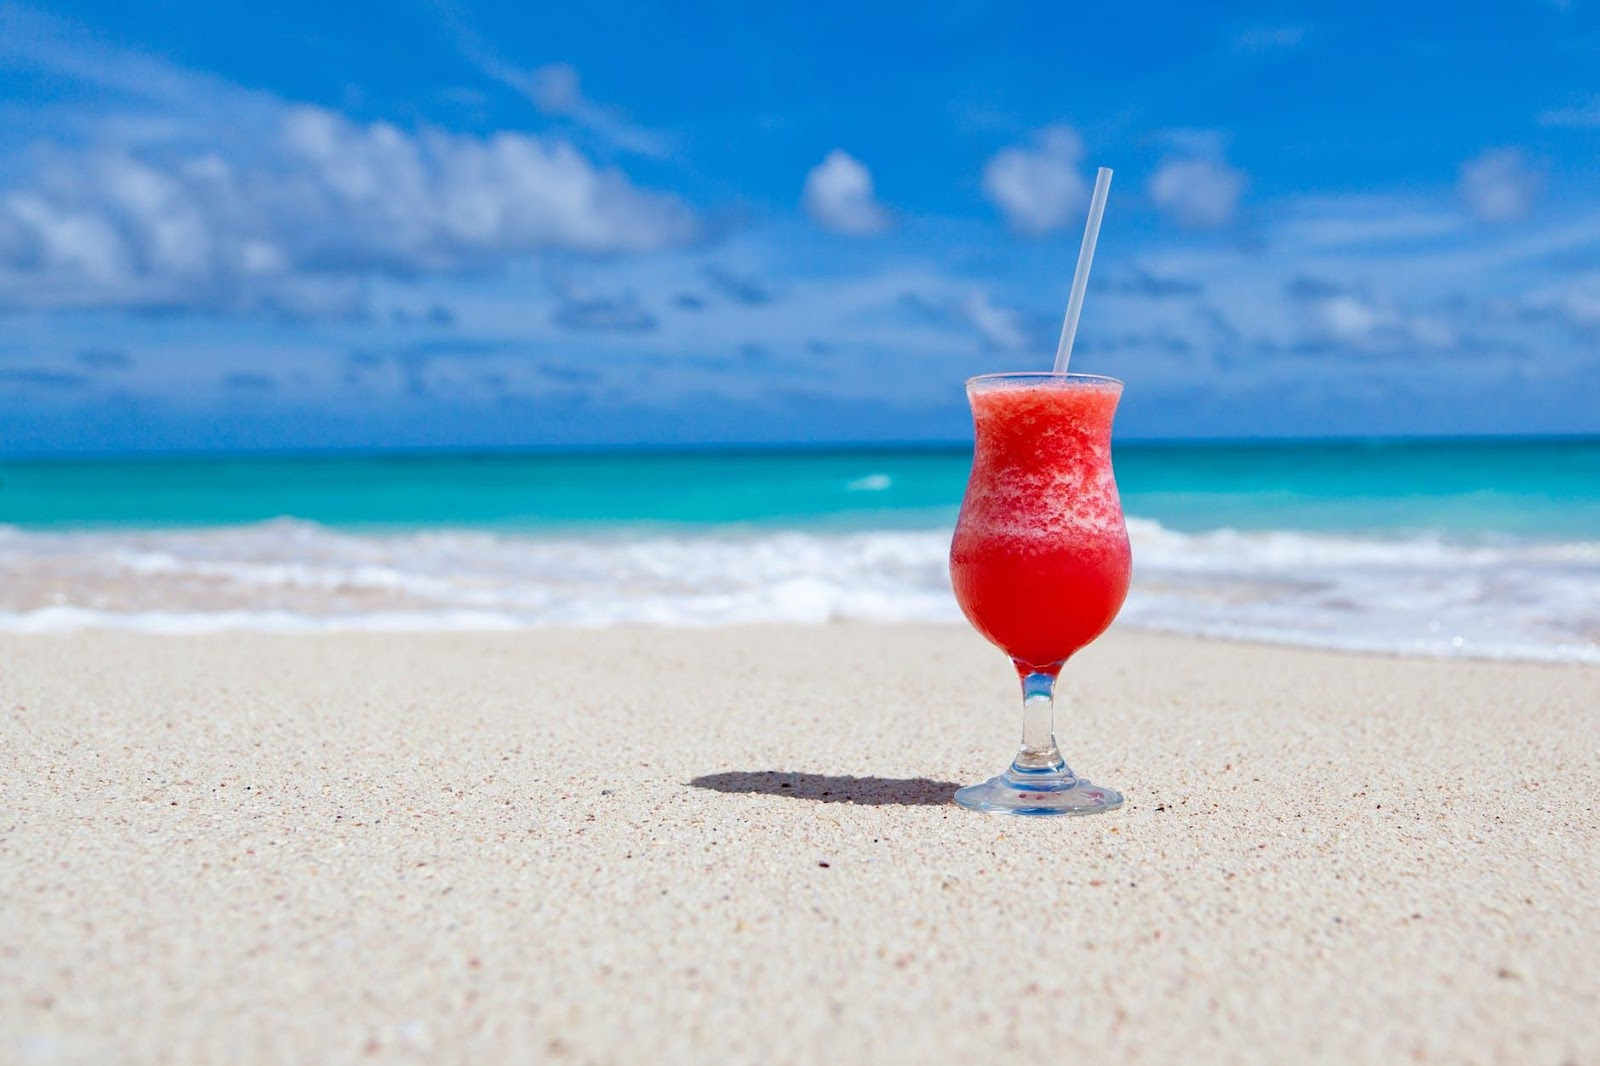 C:\Users\Ben Beard\Downloads\beach-beverage-caribbean-cocktail-68672.jpeg